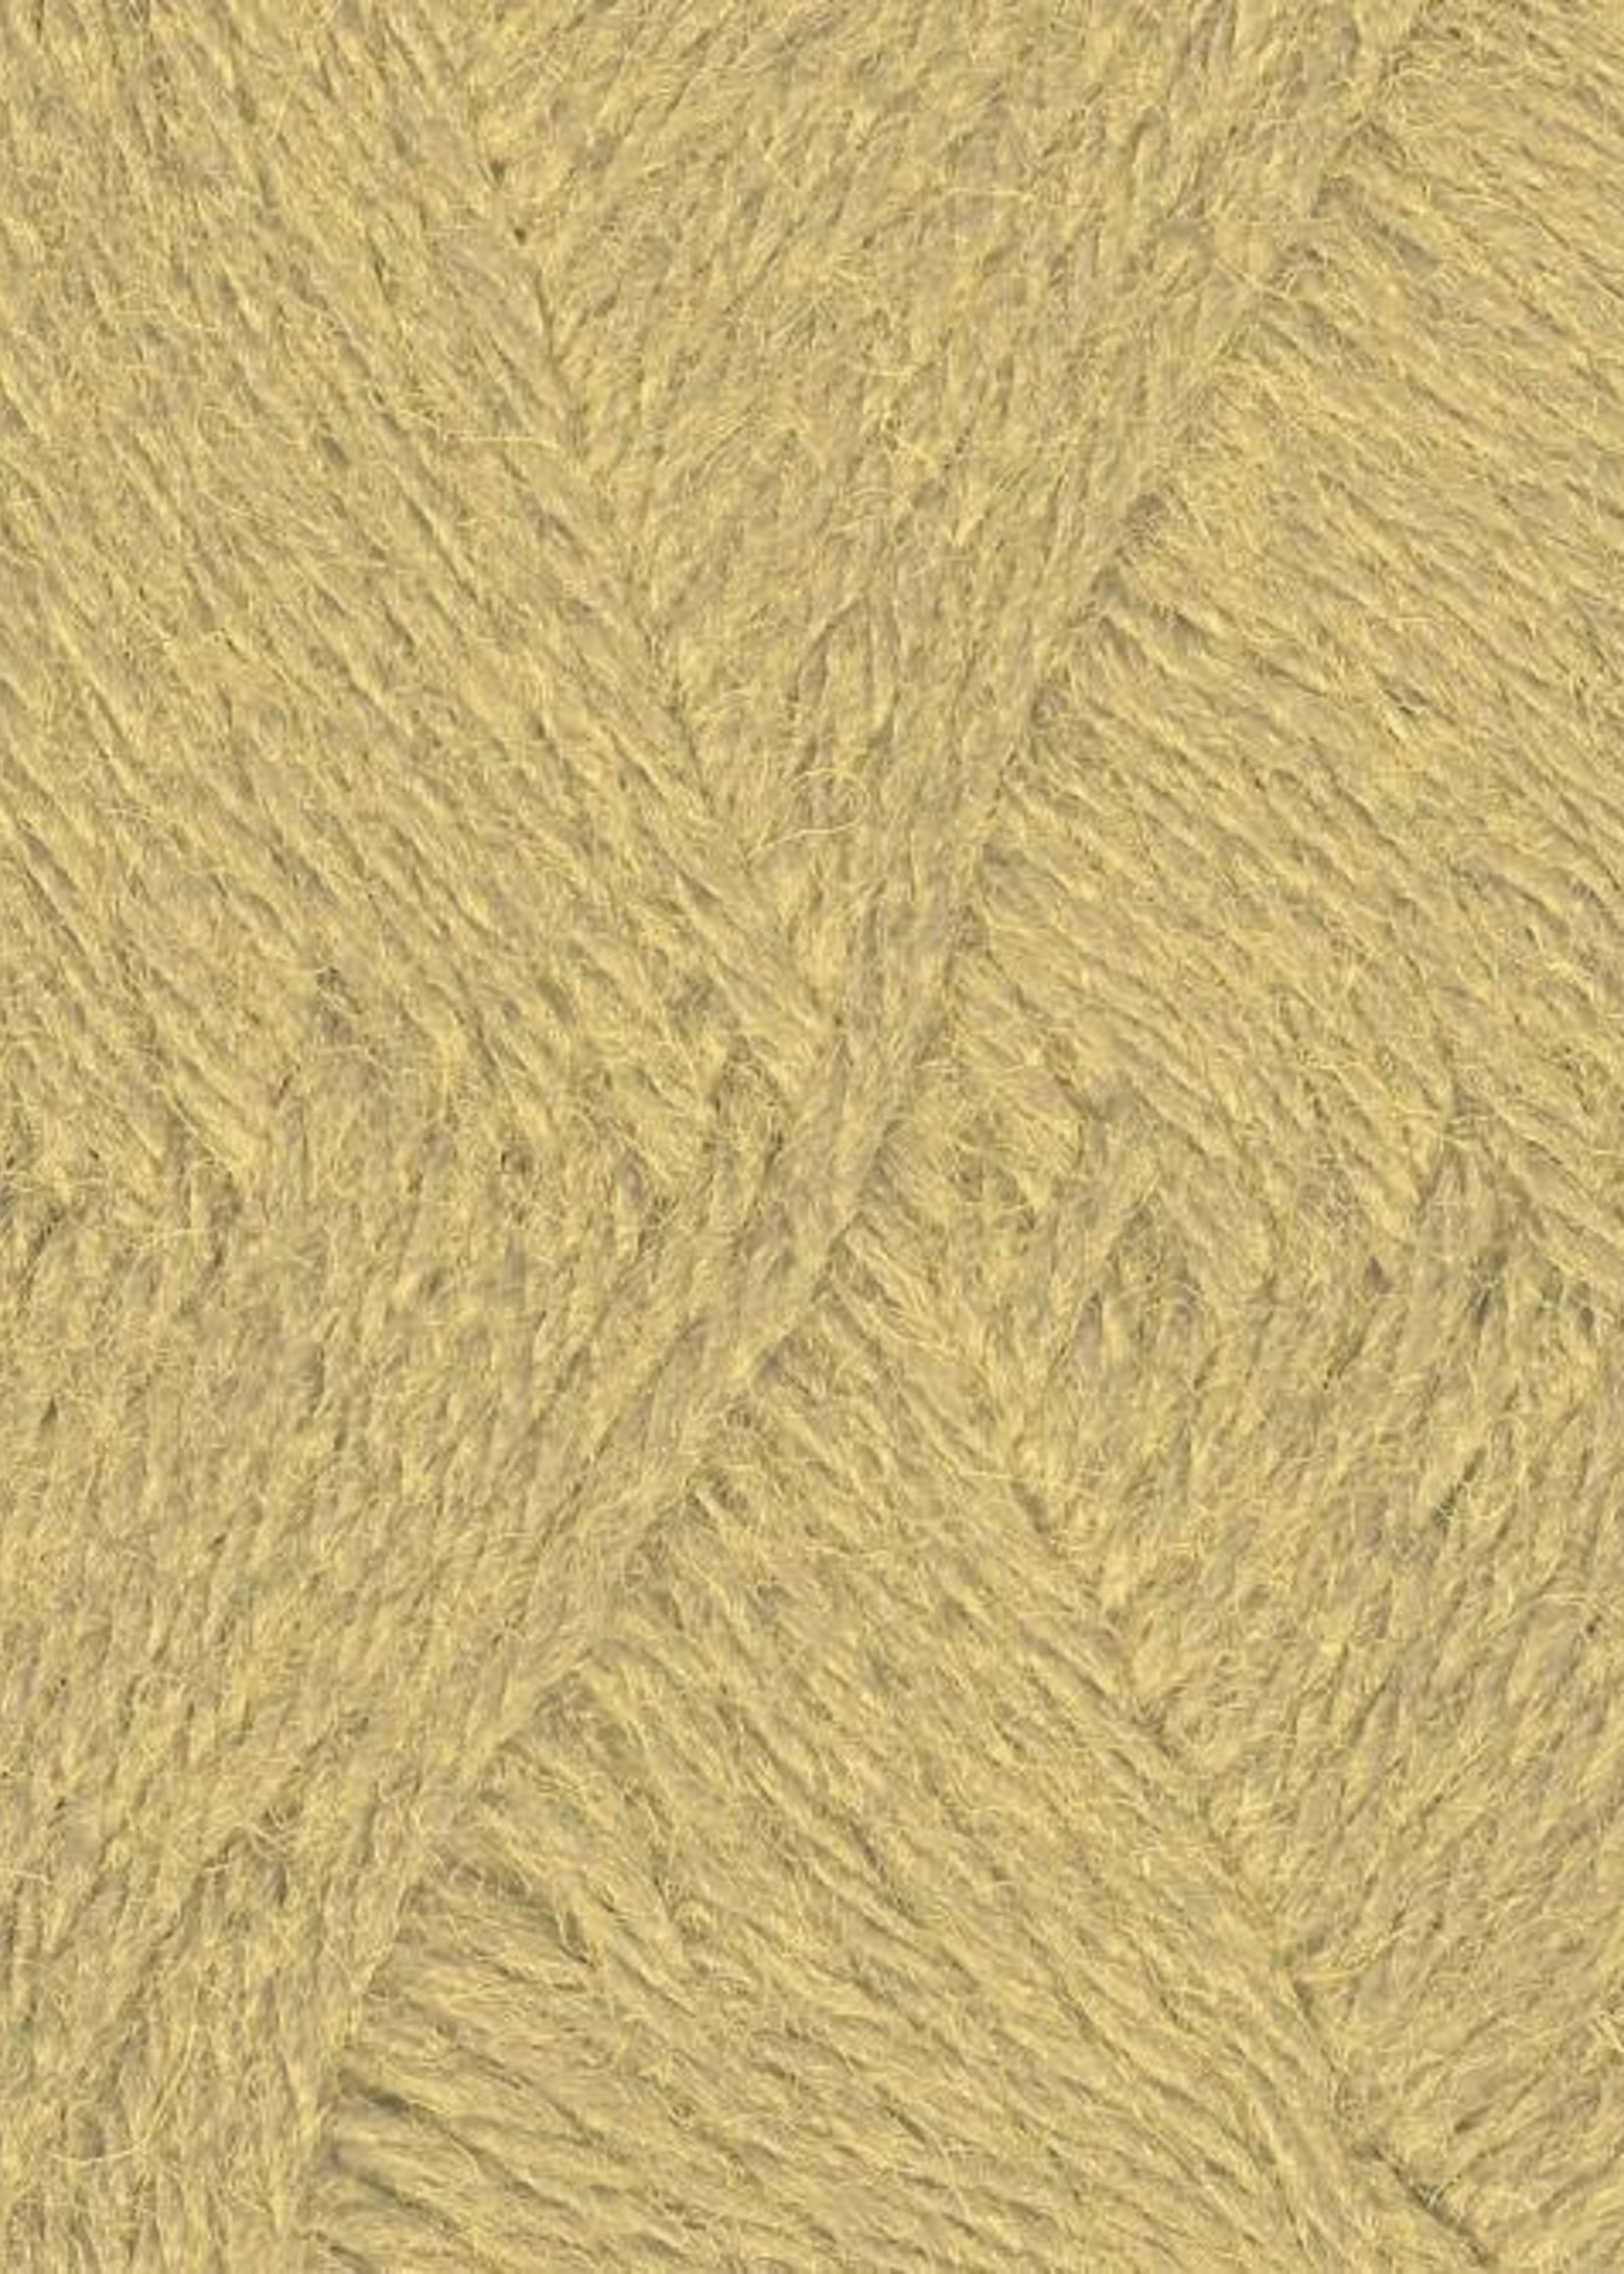 Knitting Fever KFI Collection Teenie Weenie Wool - Vanilla